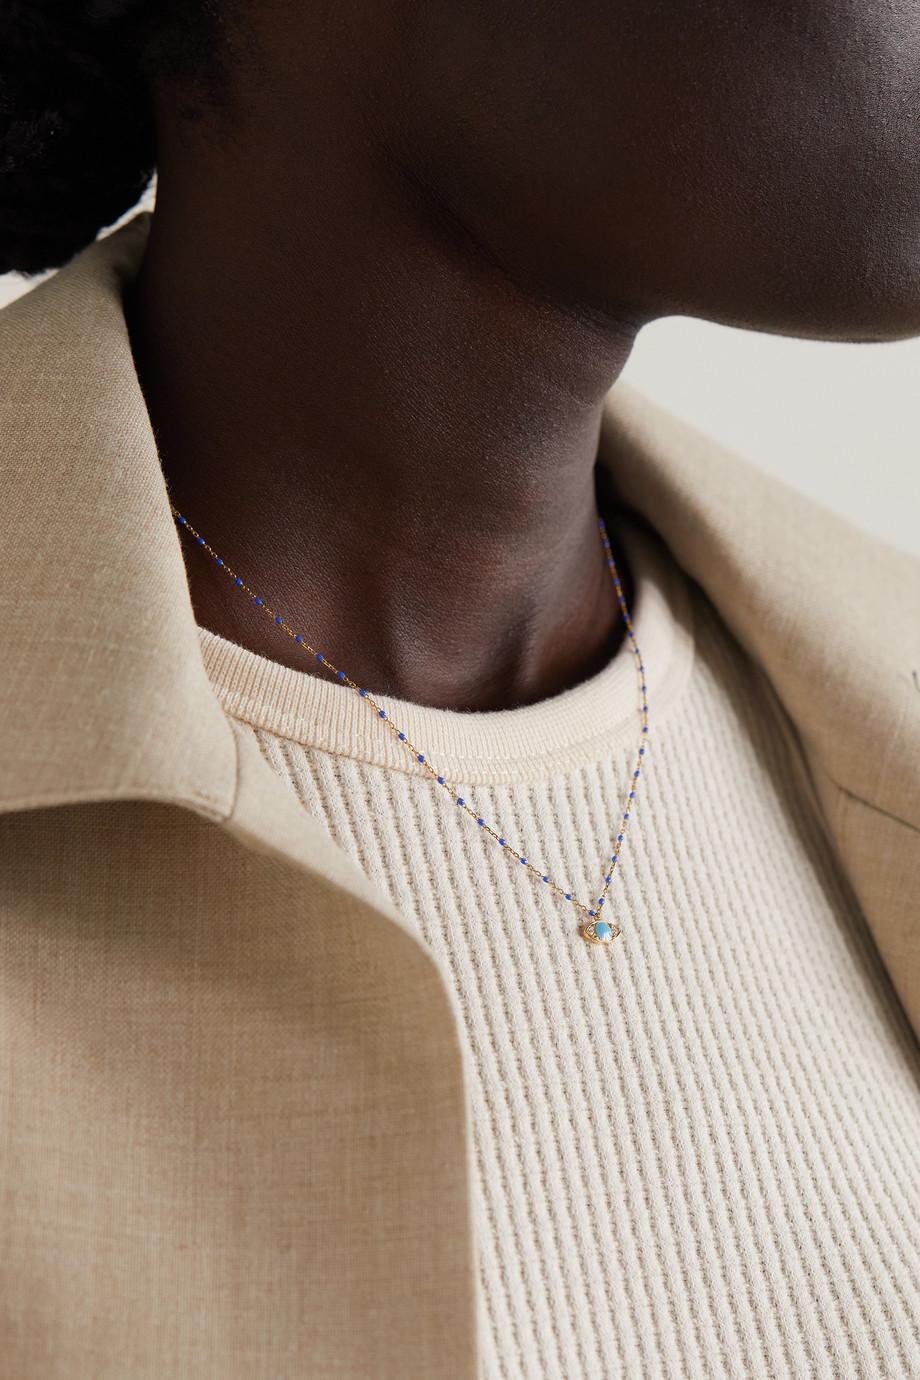 gigi CLOZEAU Eye Mini Gigi 18-karat gold, resin and diamond necklace